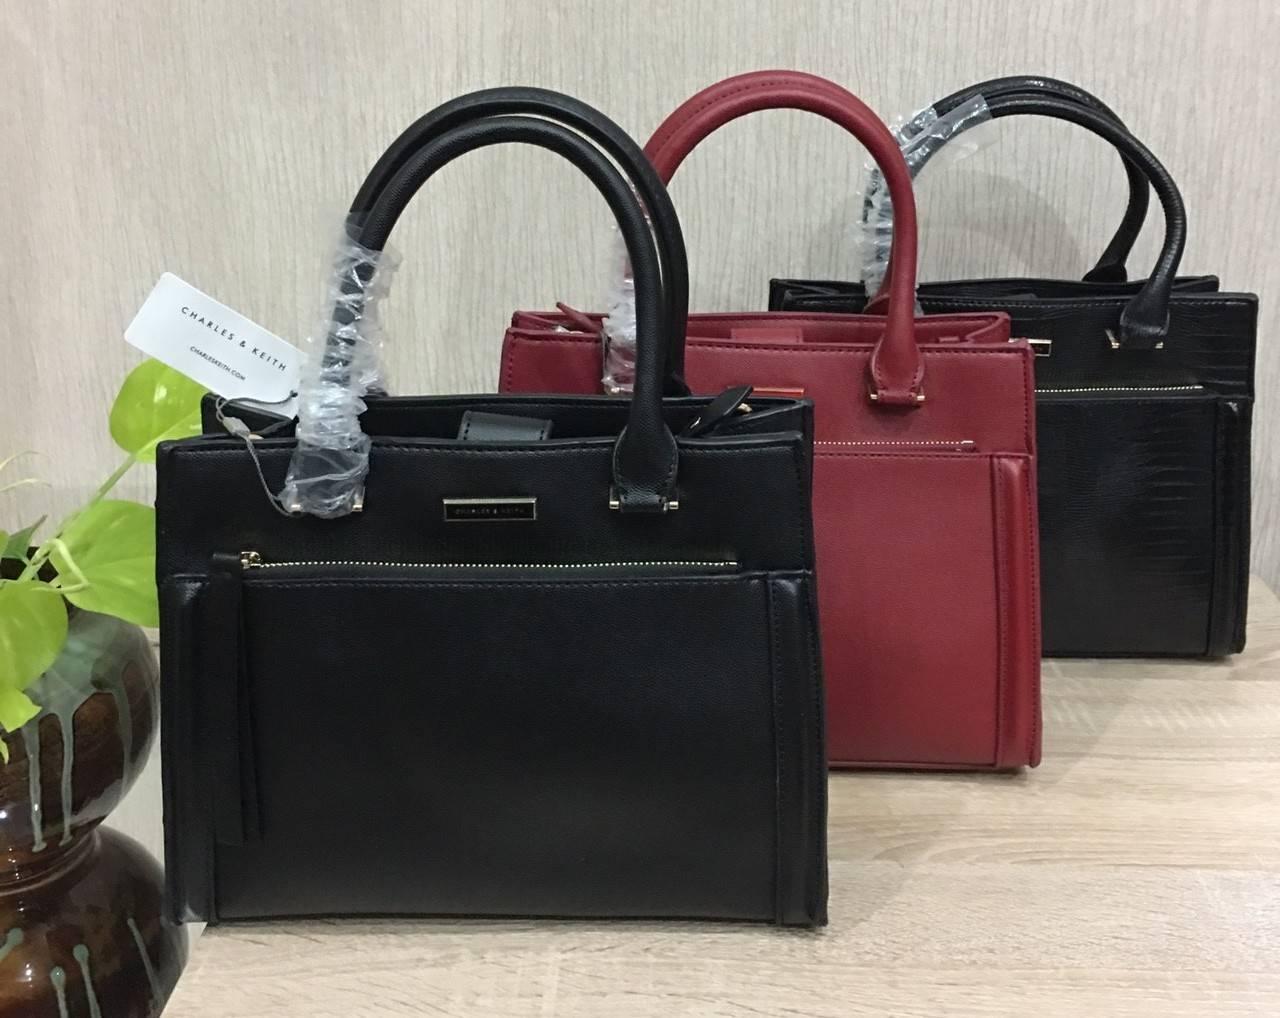 CHARLES & KEITH BAG กระเป๋าทรงเหลี่ยมวางอยู่ทรง มี 4 สี